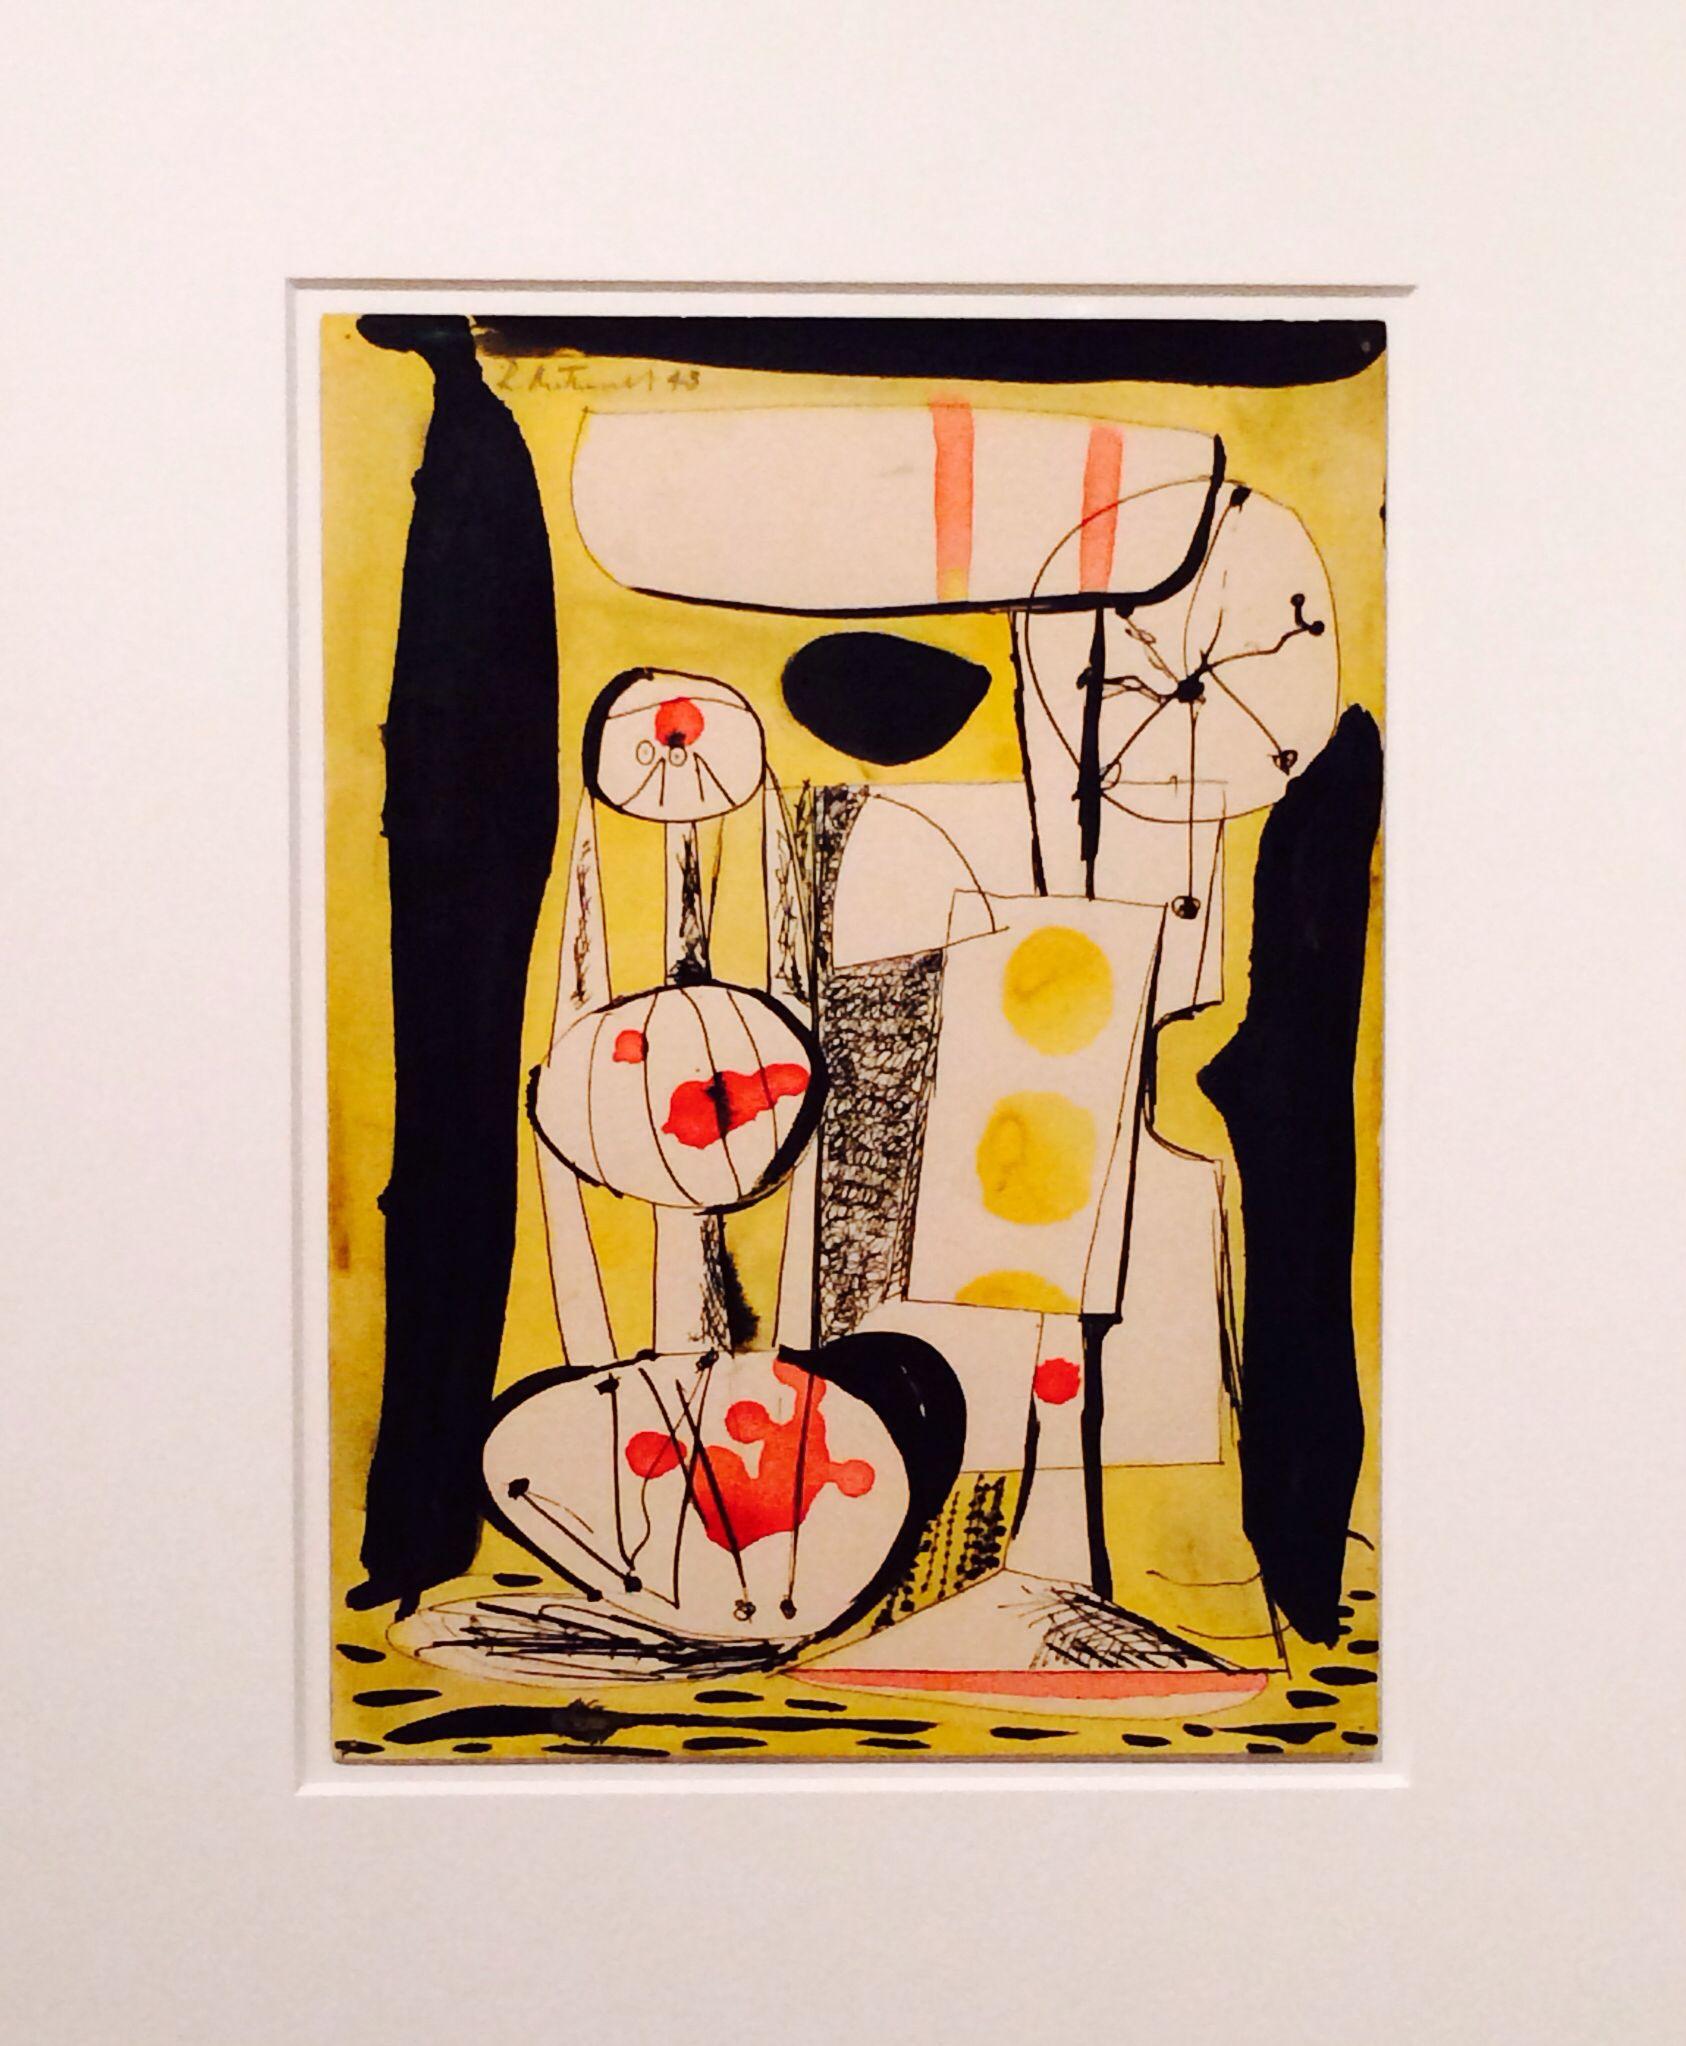 Robert Motherwell at the Guggenheim Museum